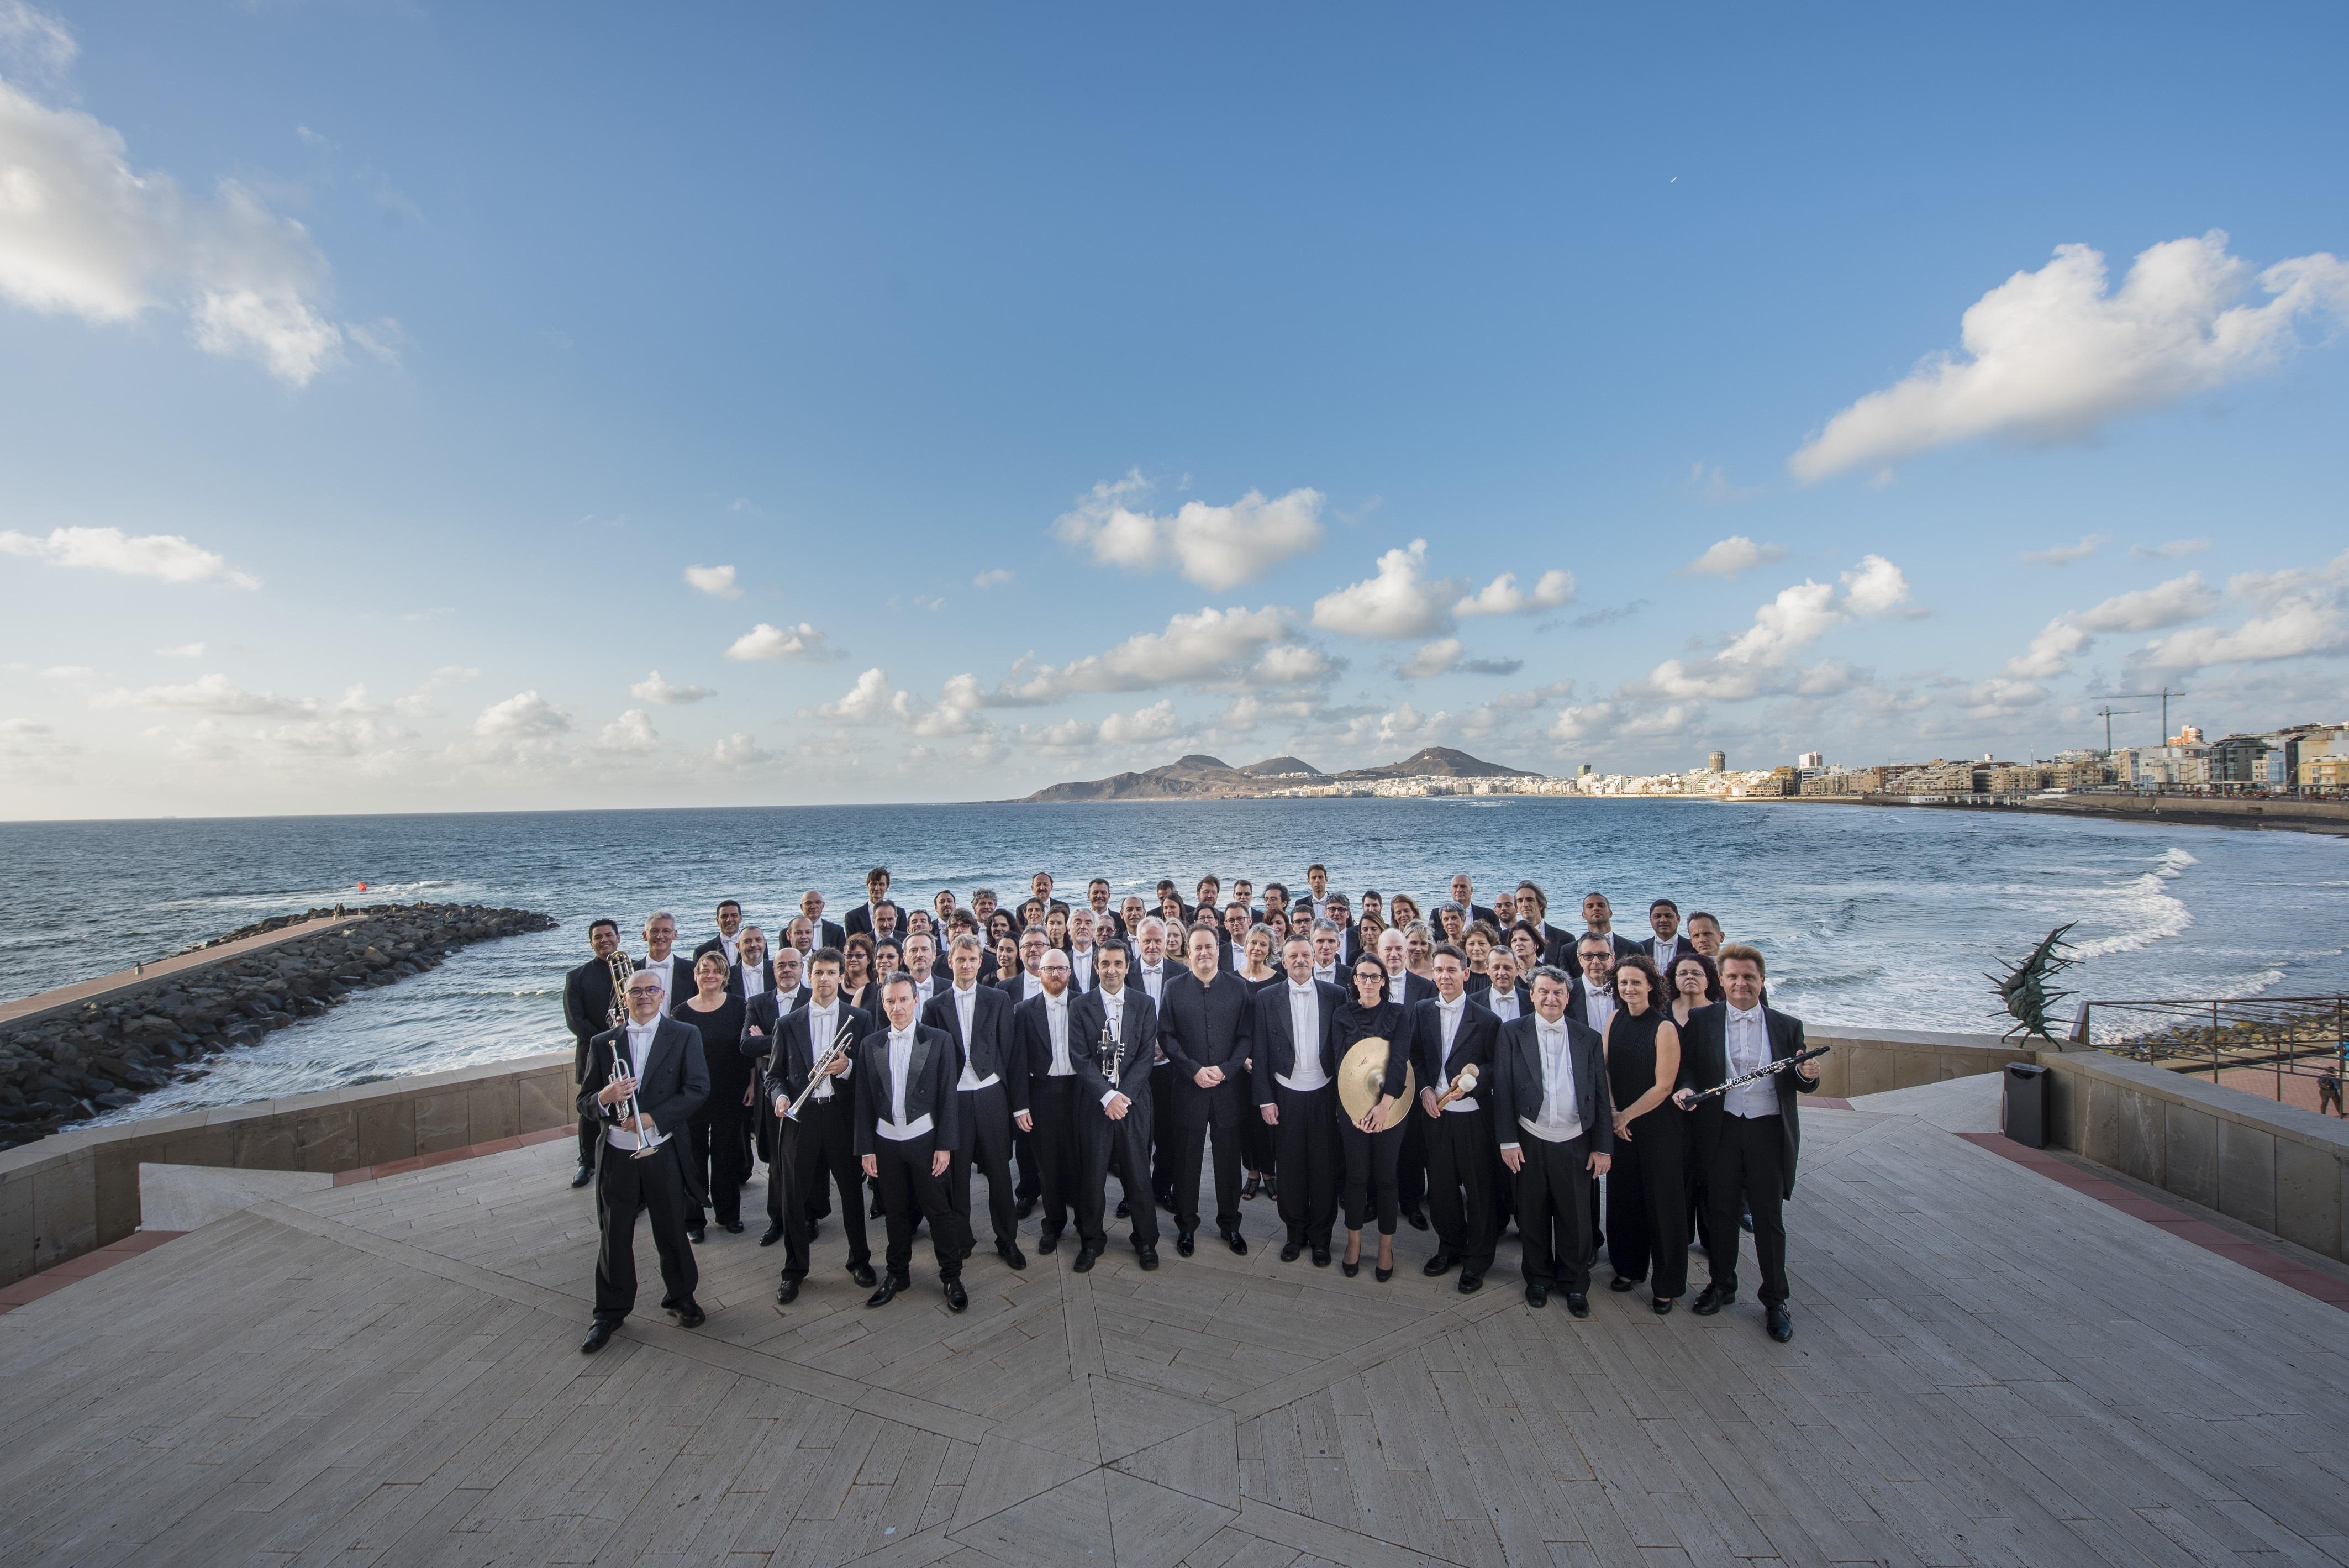 Orquesta Filarmónica de Gran Canaria (OFGC). C Nacho González